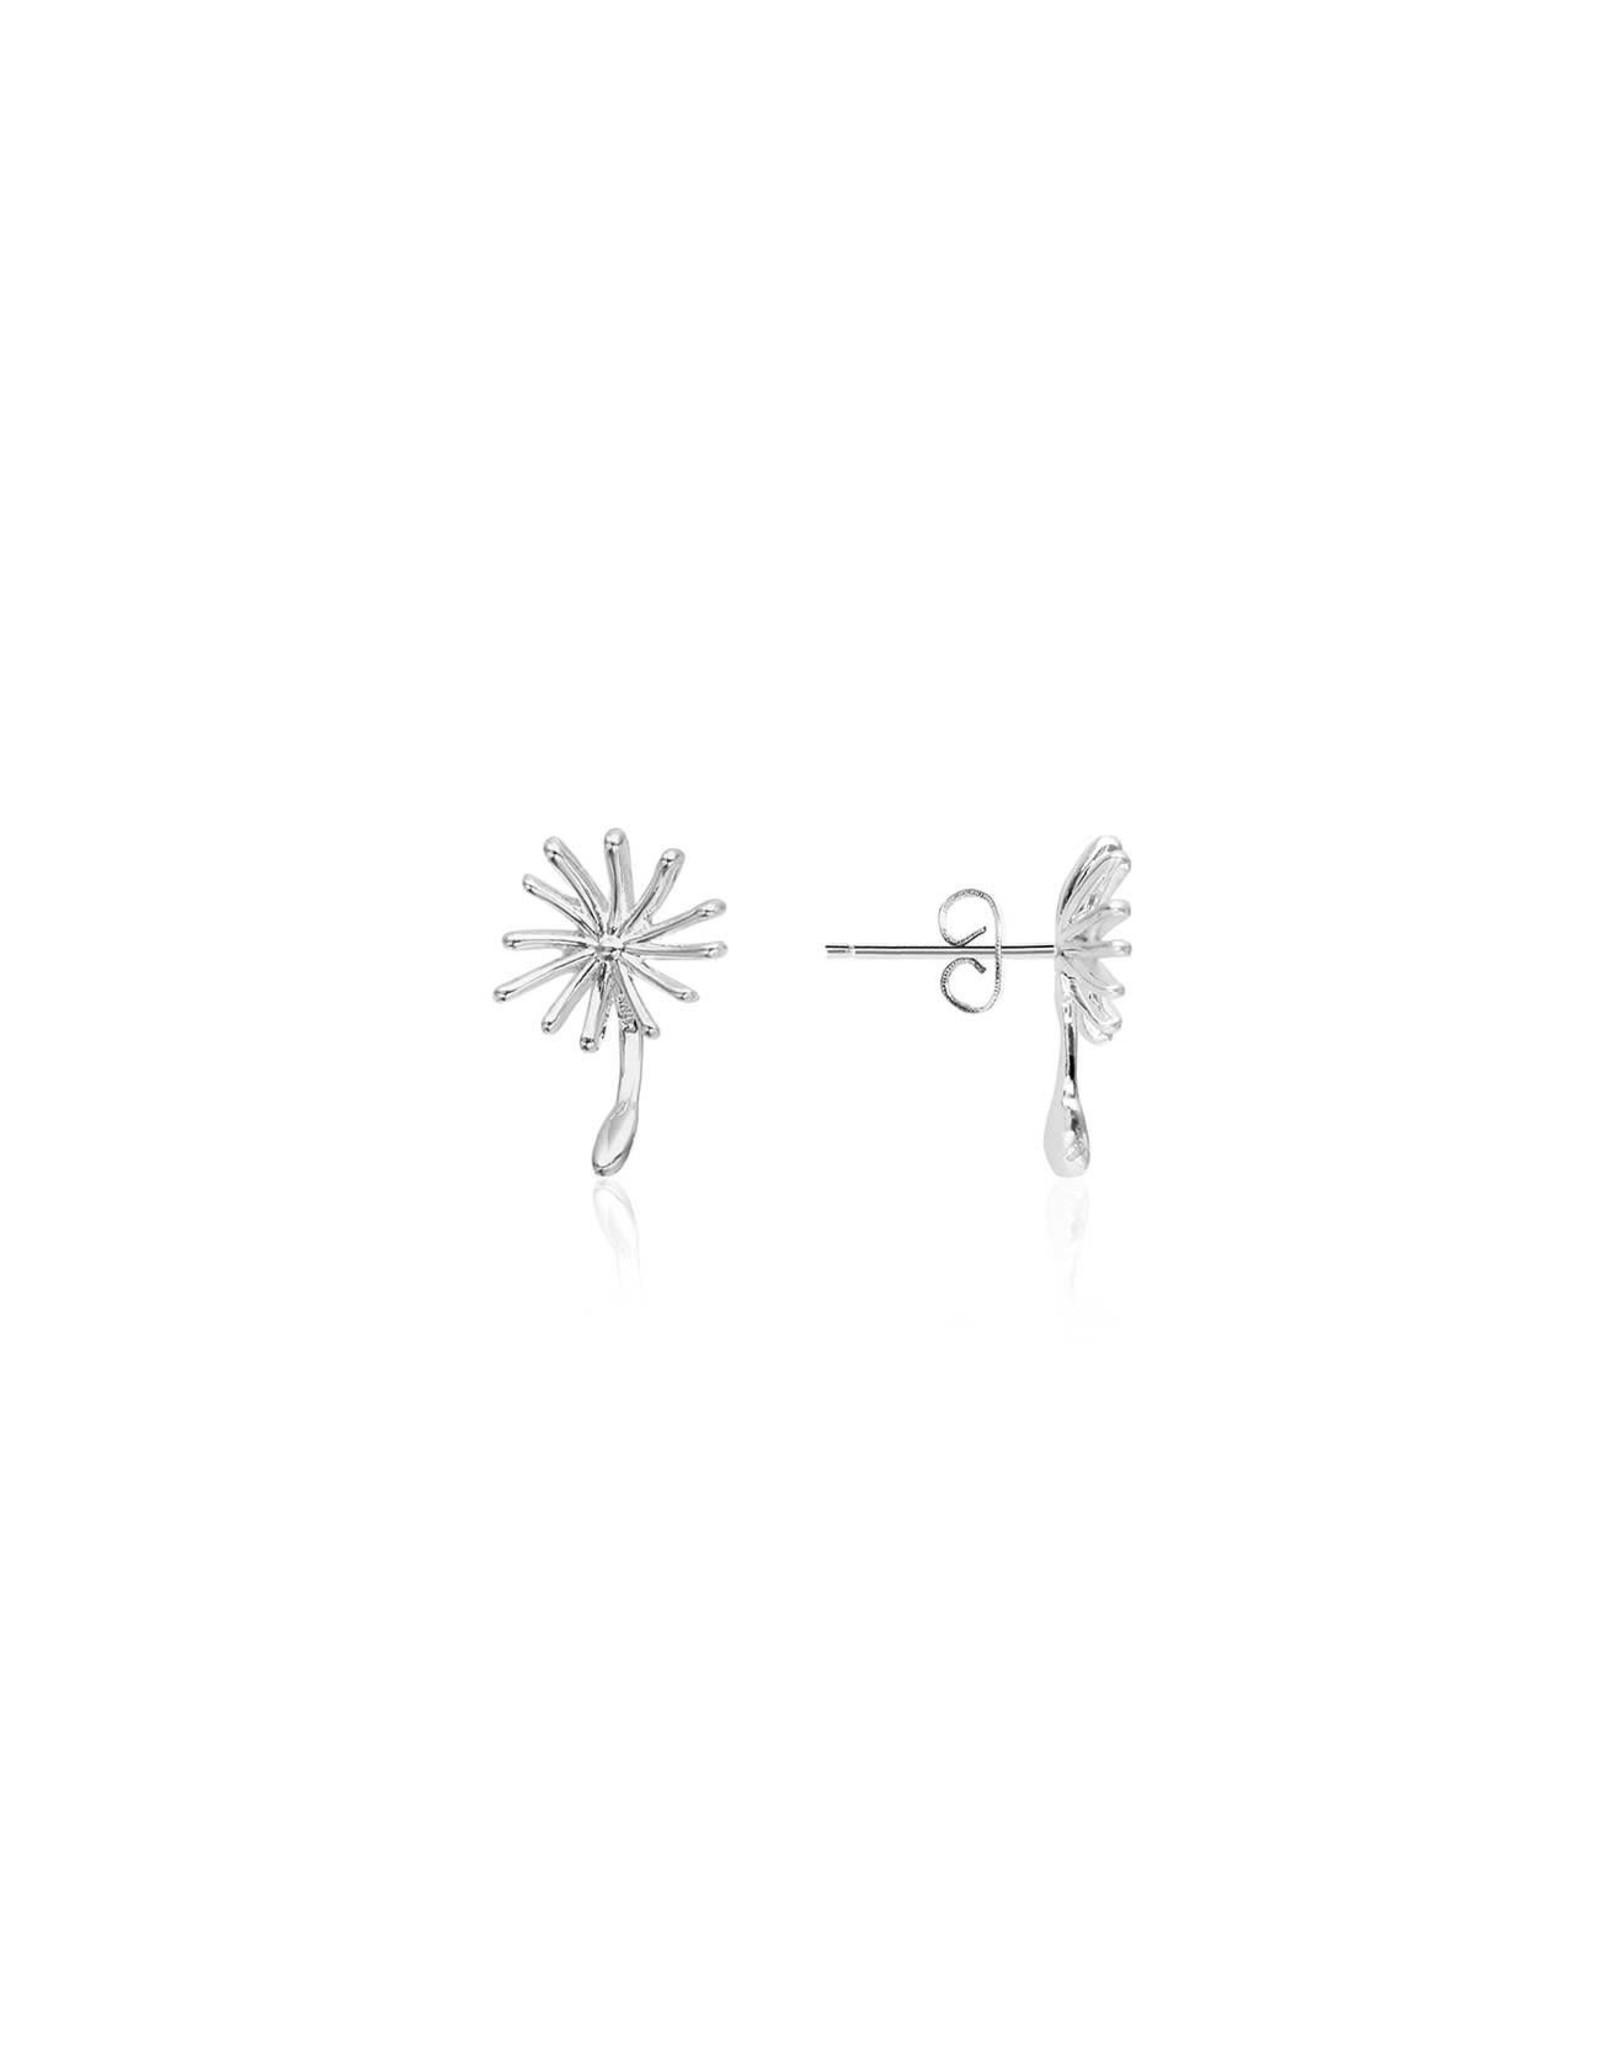 Joma Jewellery Treasure the Little Things Oorbellen - Make a Wish